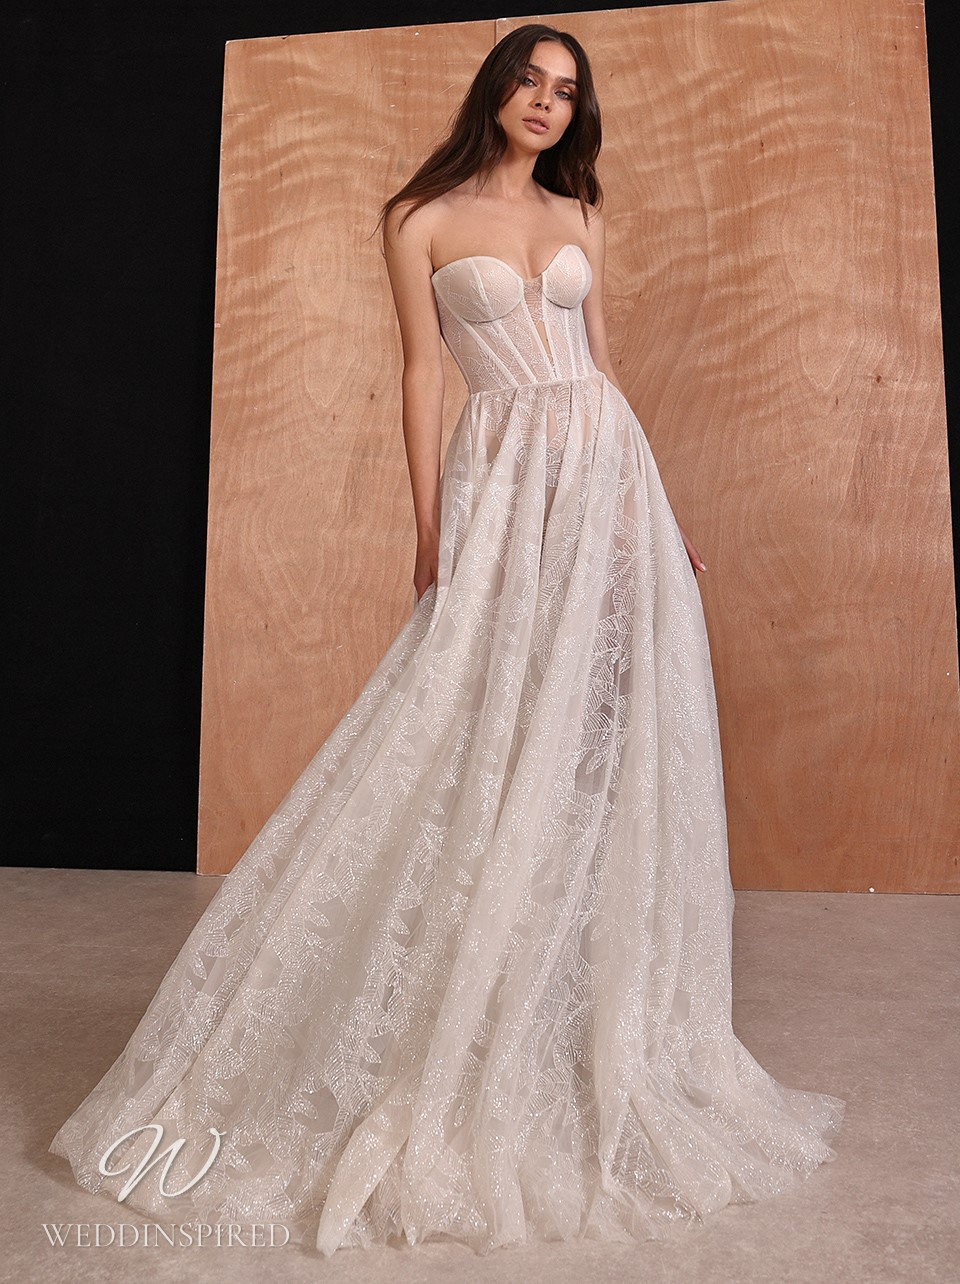 A Galia Lahav 2022 strapless lace A-line wedding dress